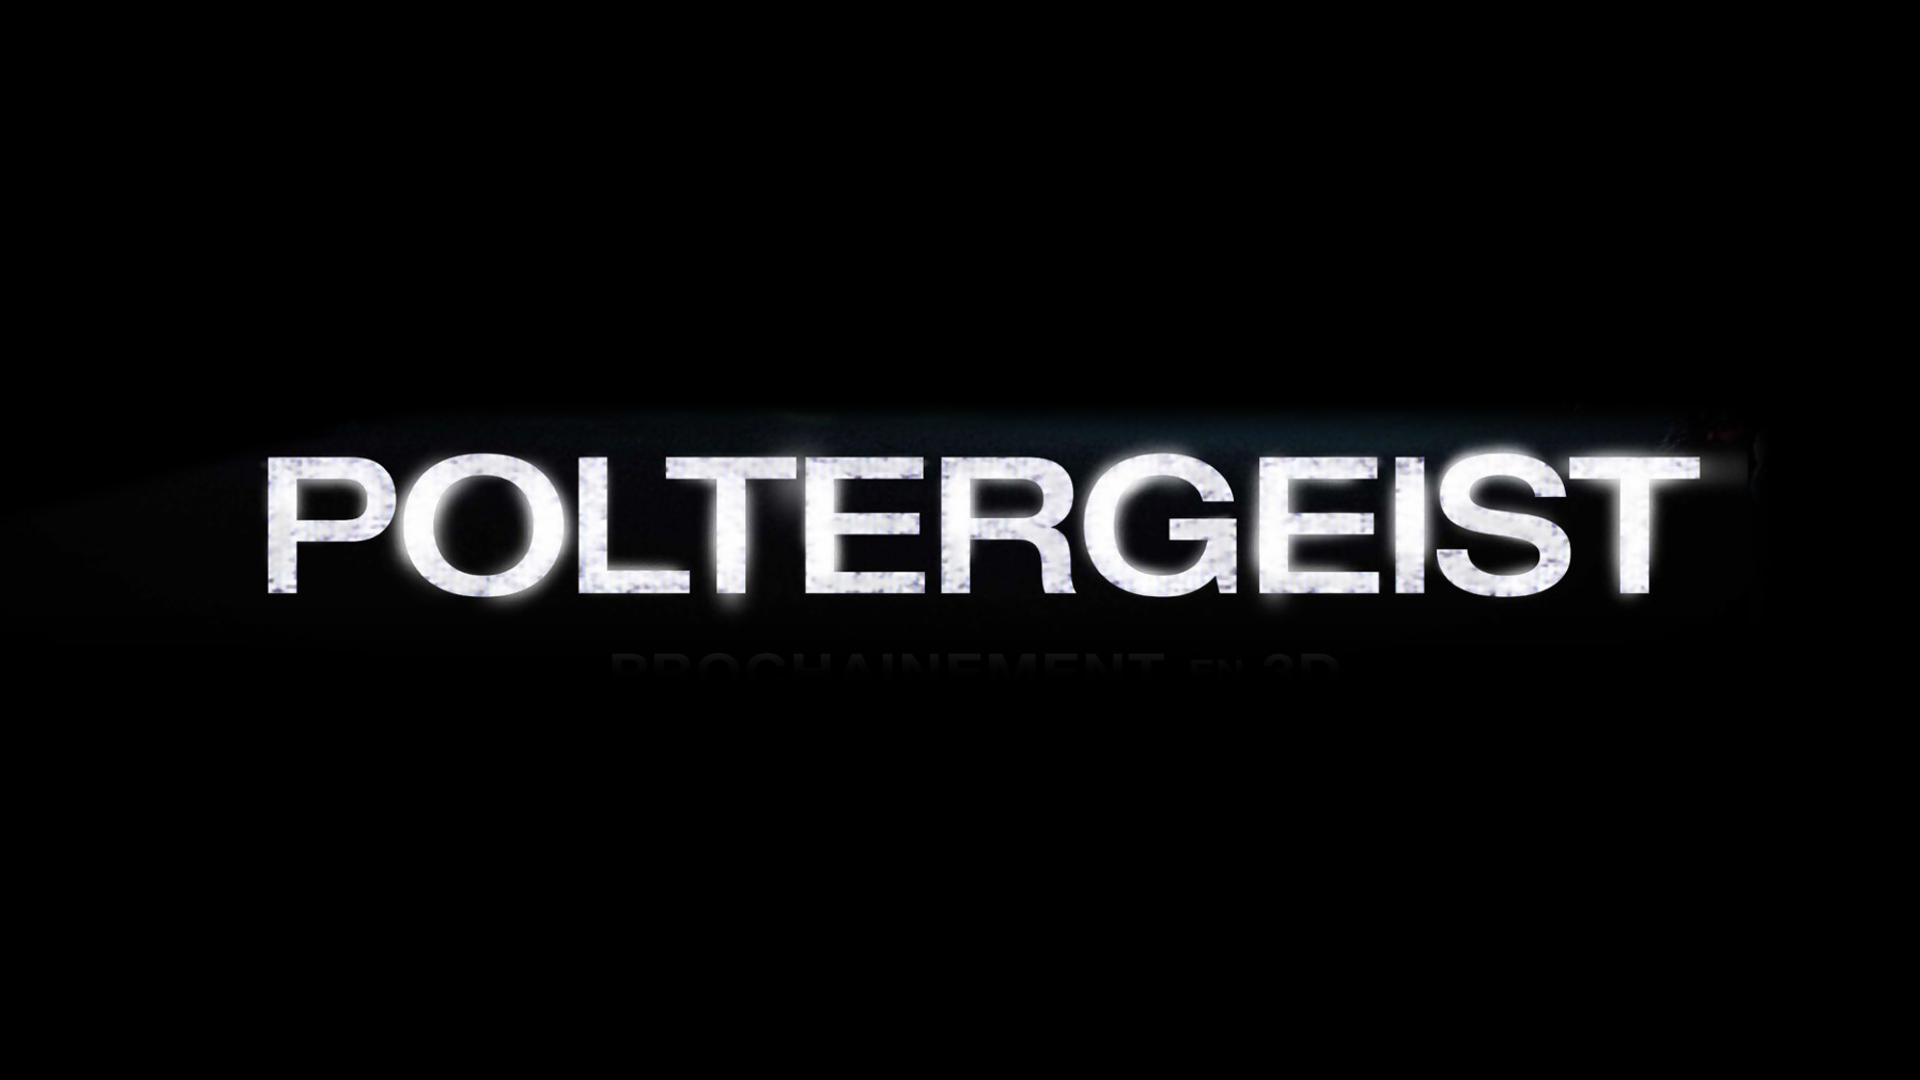 COVER-POLTERGEIST / NOOGADESIGN